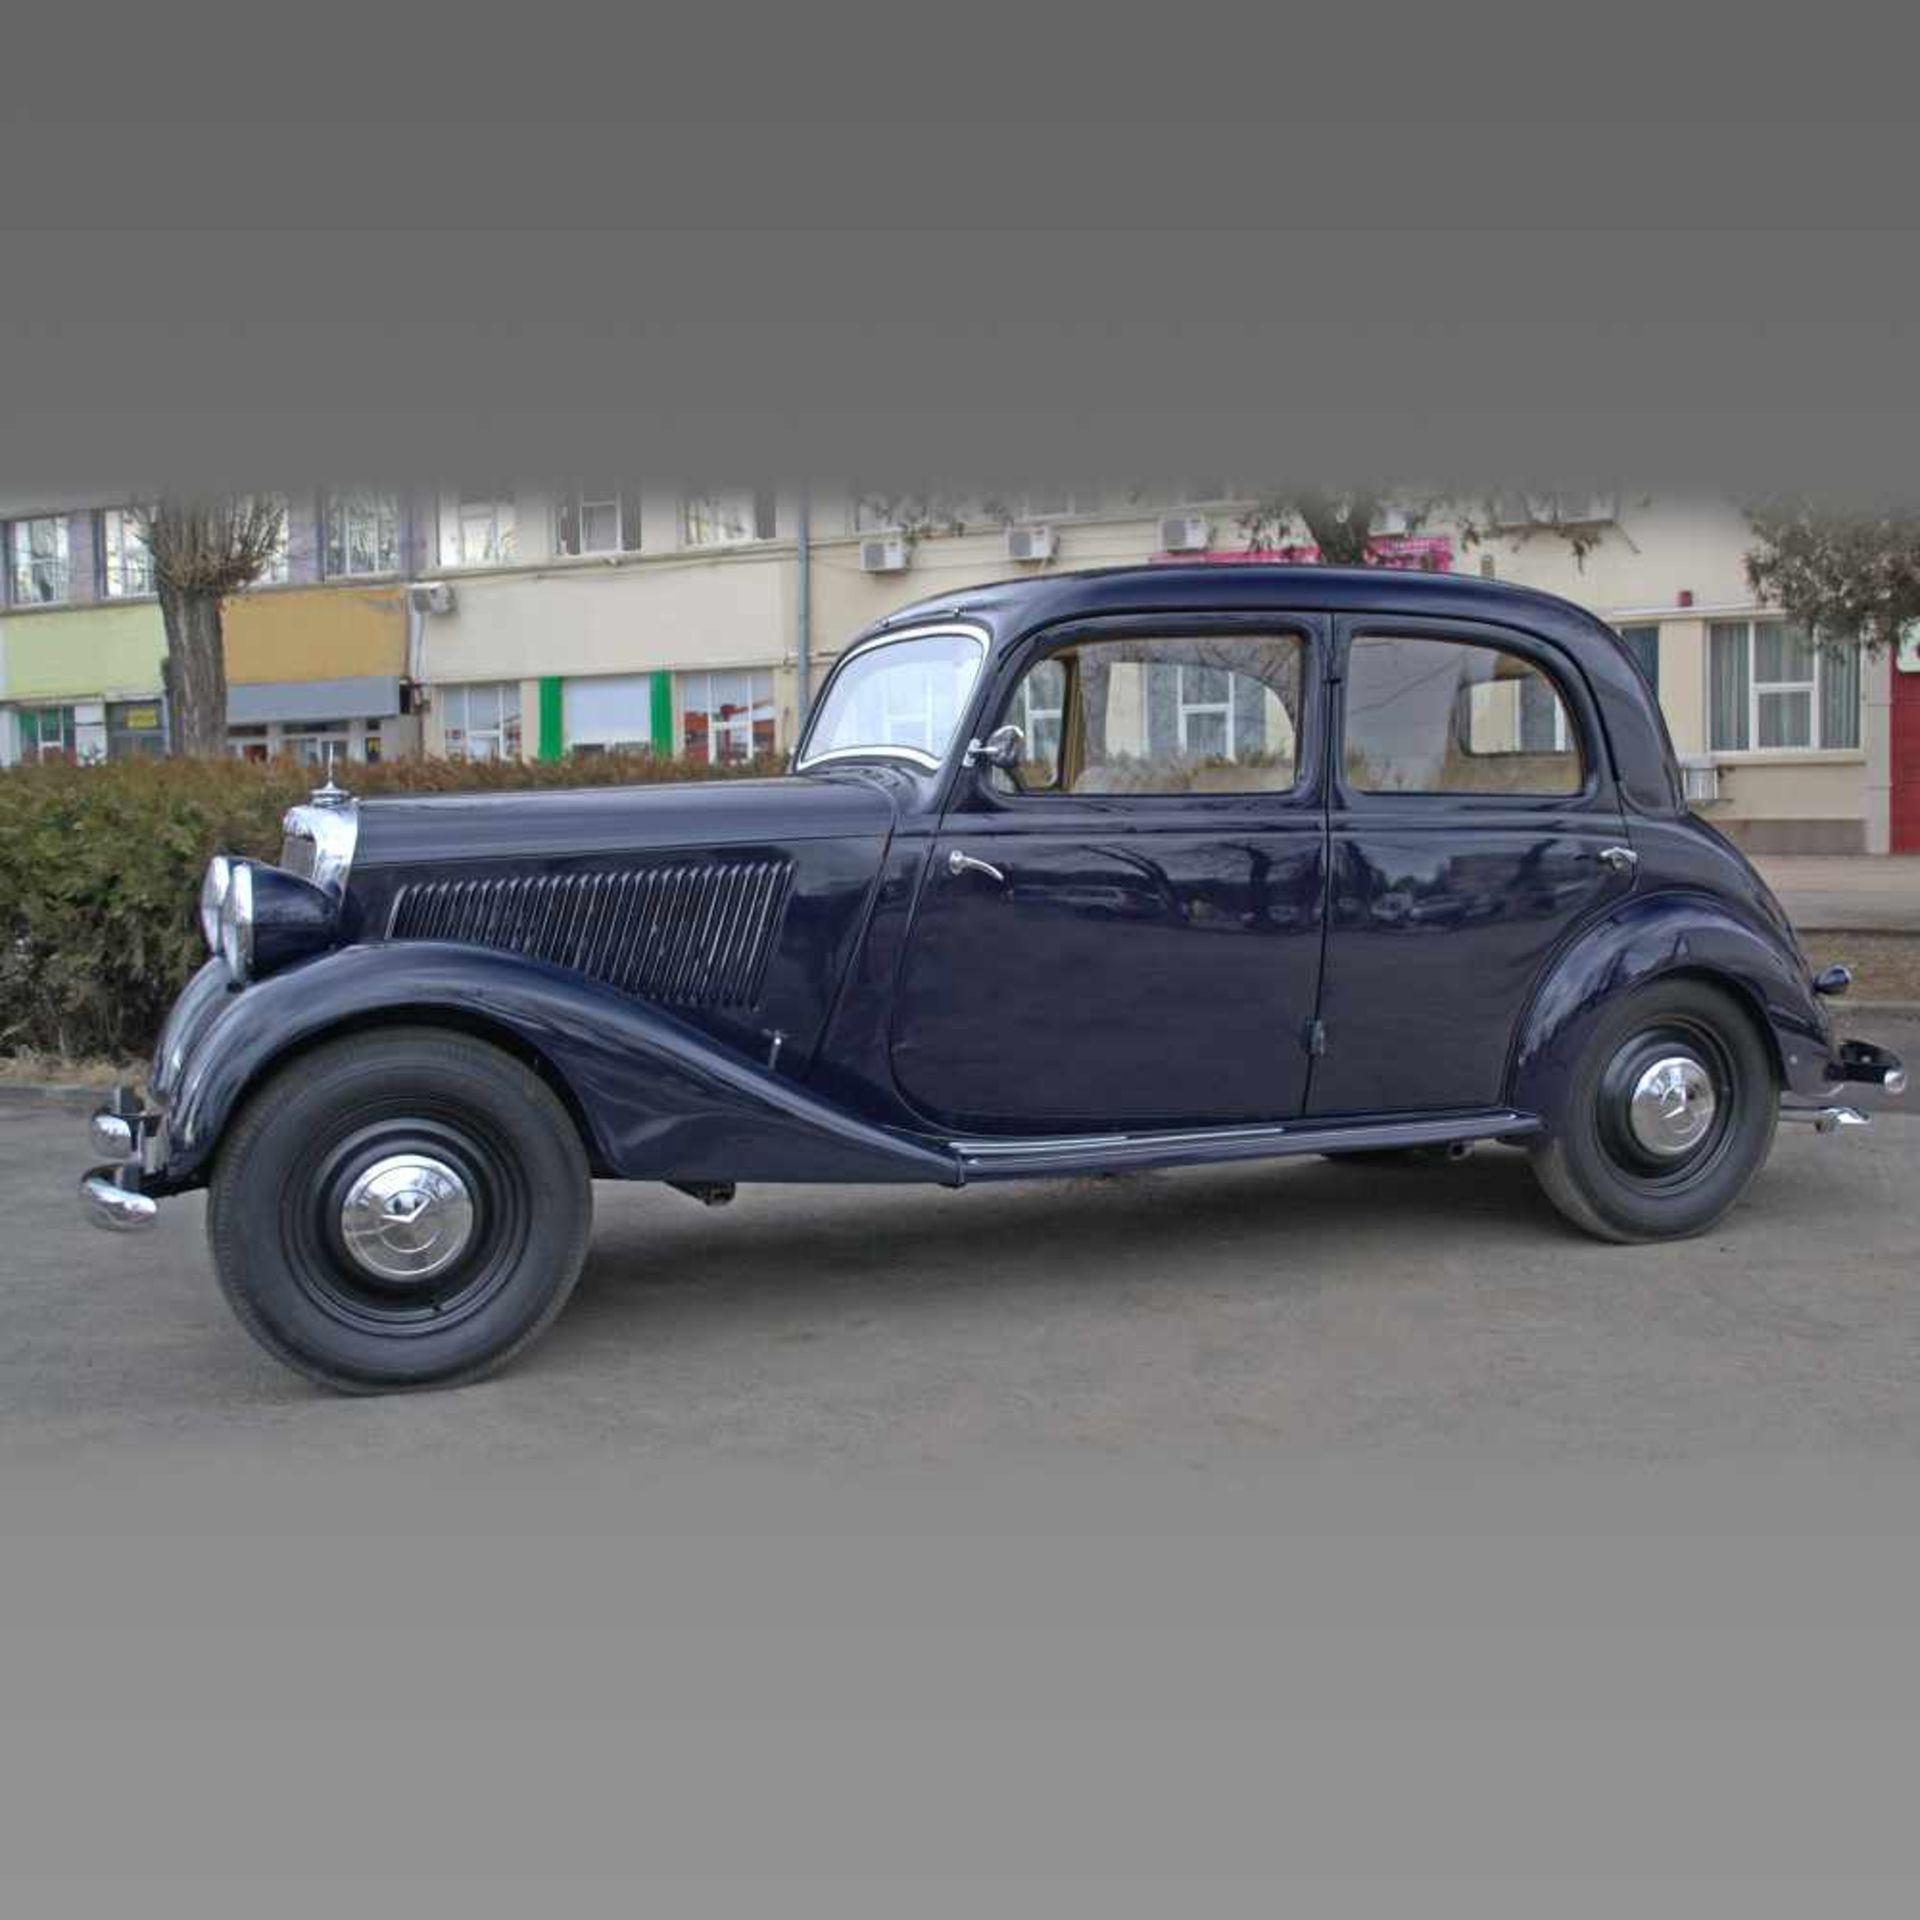 Mercedes 170 V, 1940, the most popular Mercedes-Benz model of the time - Bild 2 aus 4